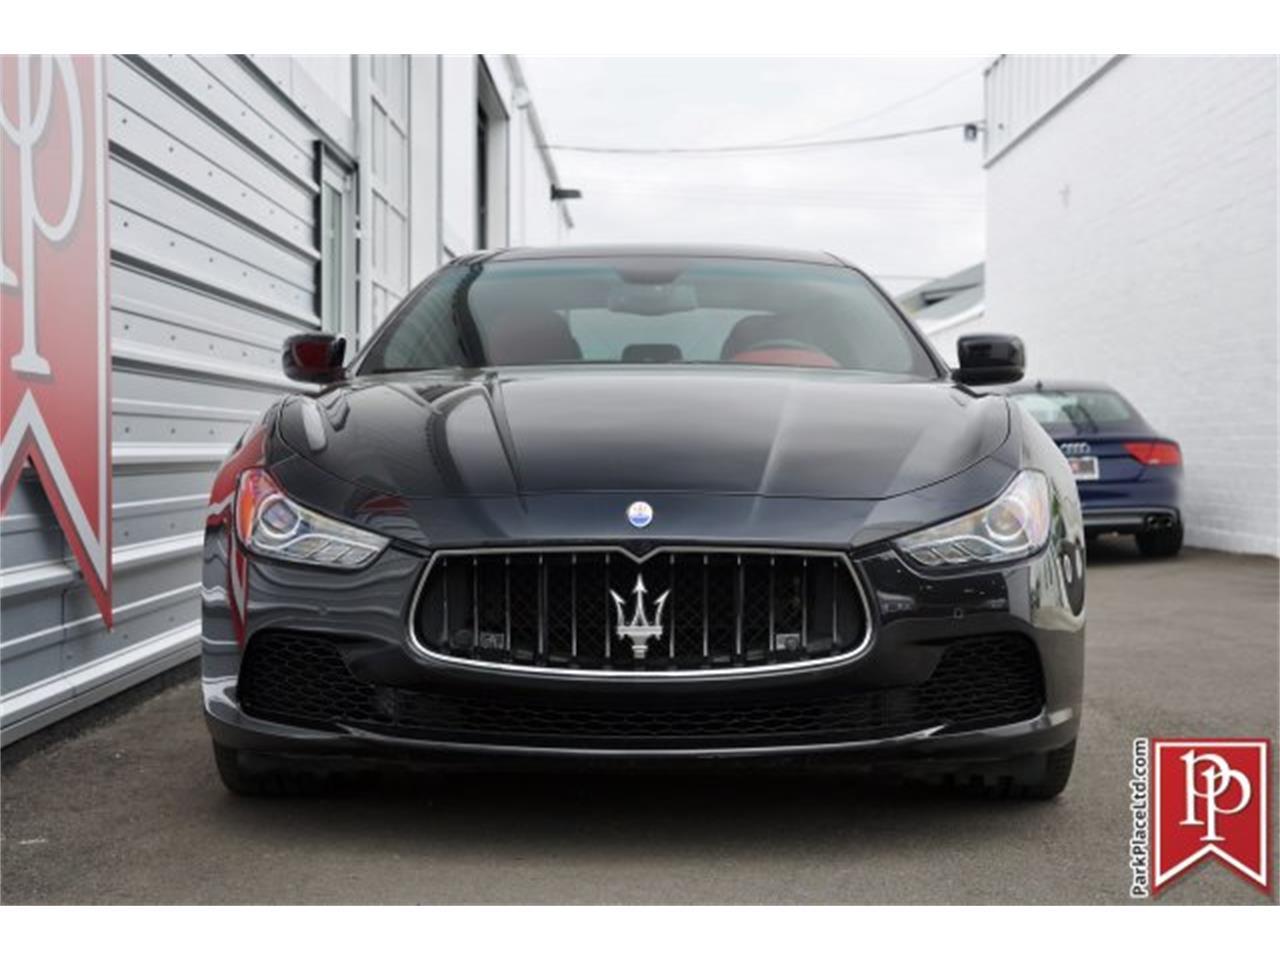 Large Picture of 2014 Maserati Ghibli - $44,950.00 - LB5K